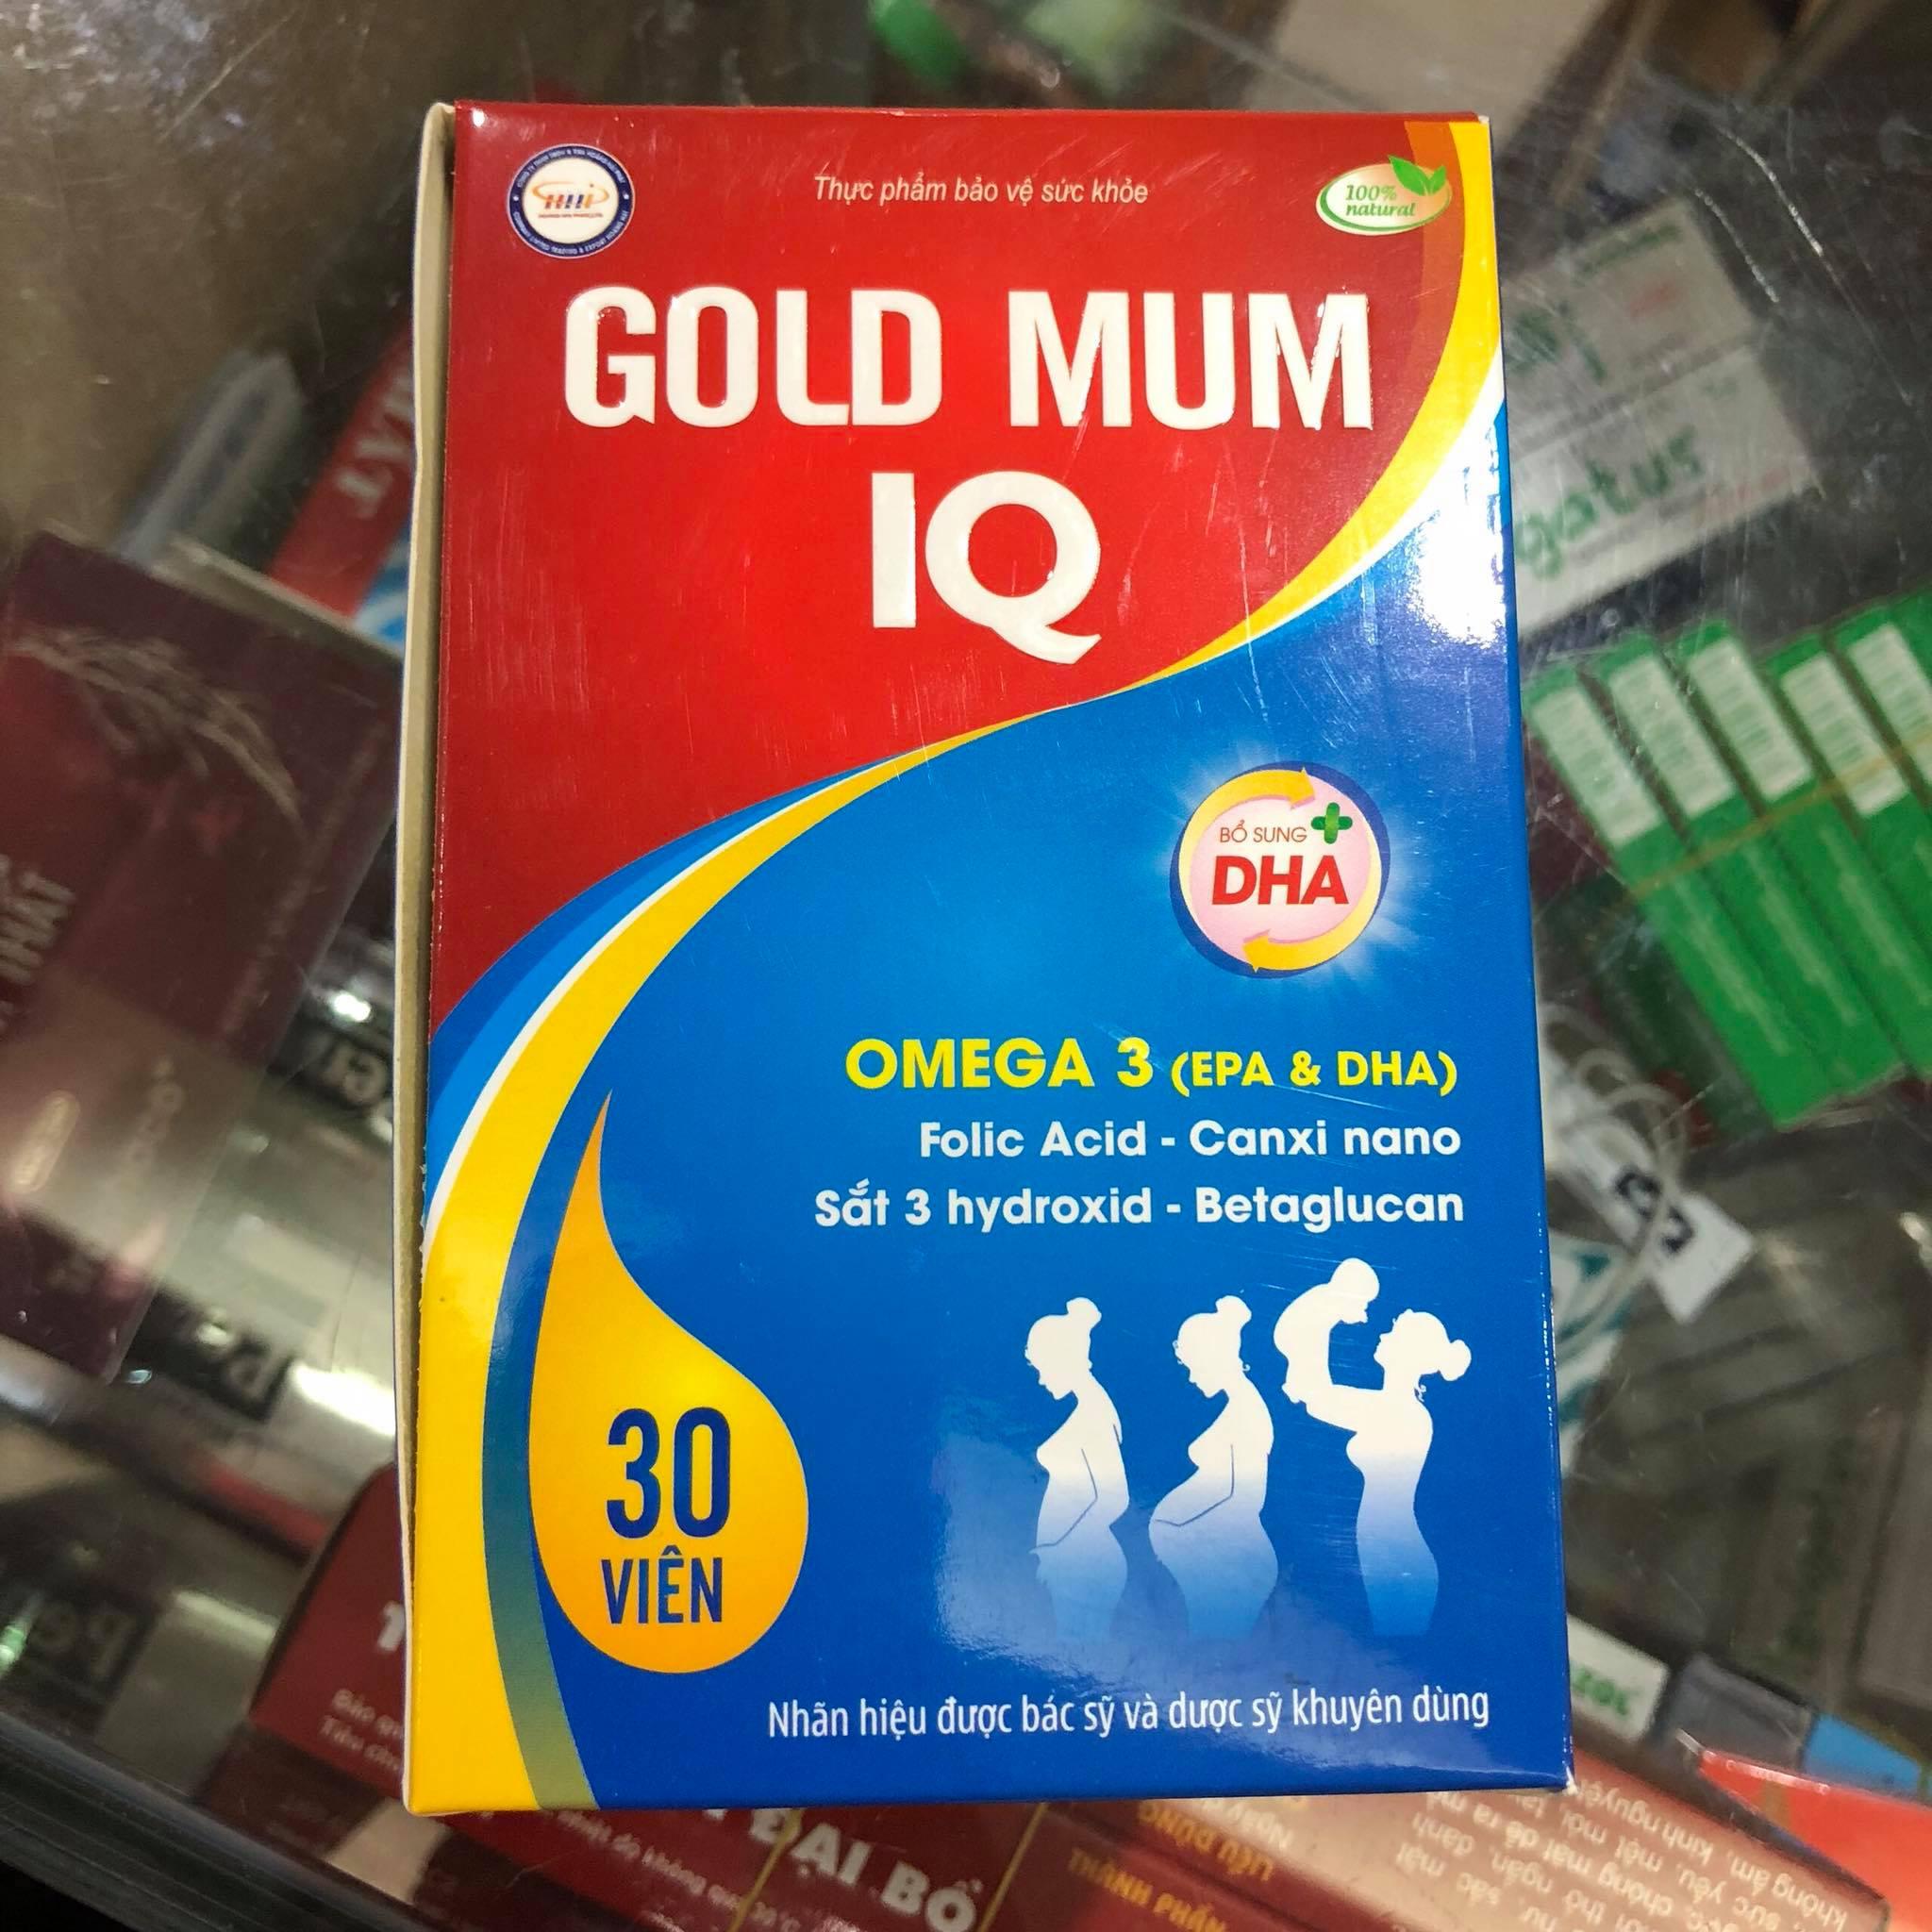 Gold Mum IQ